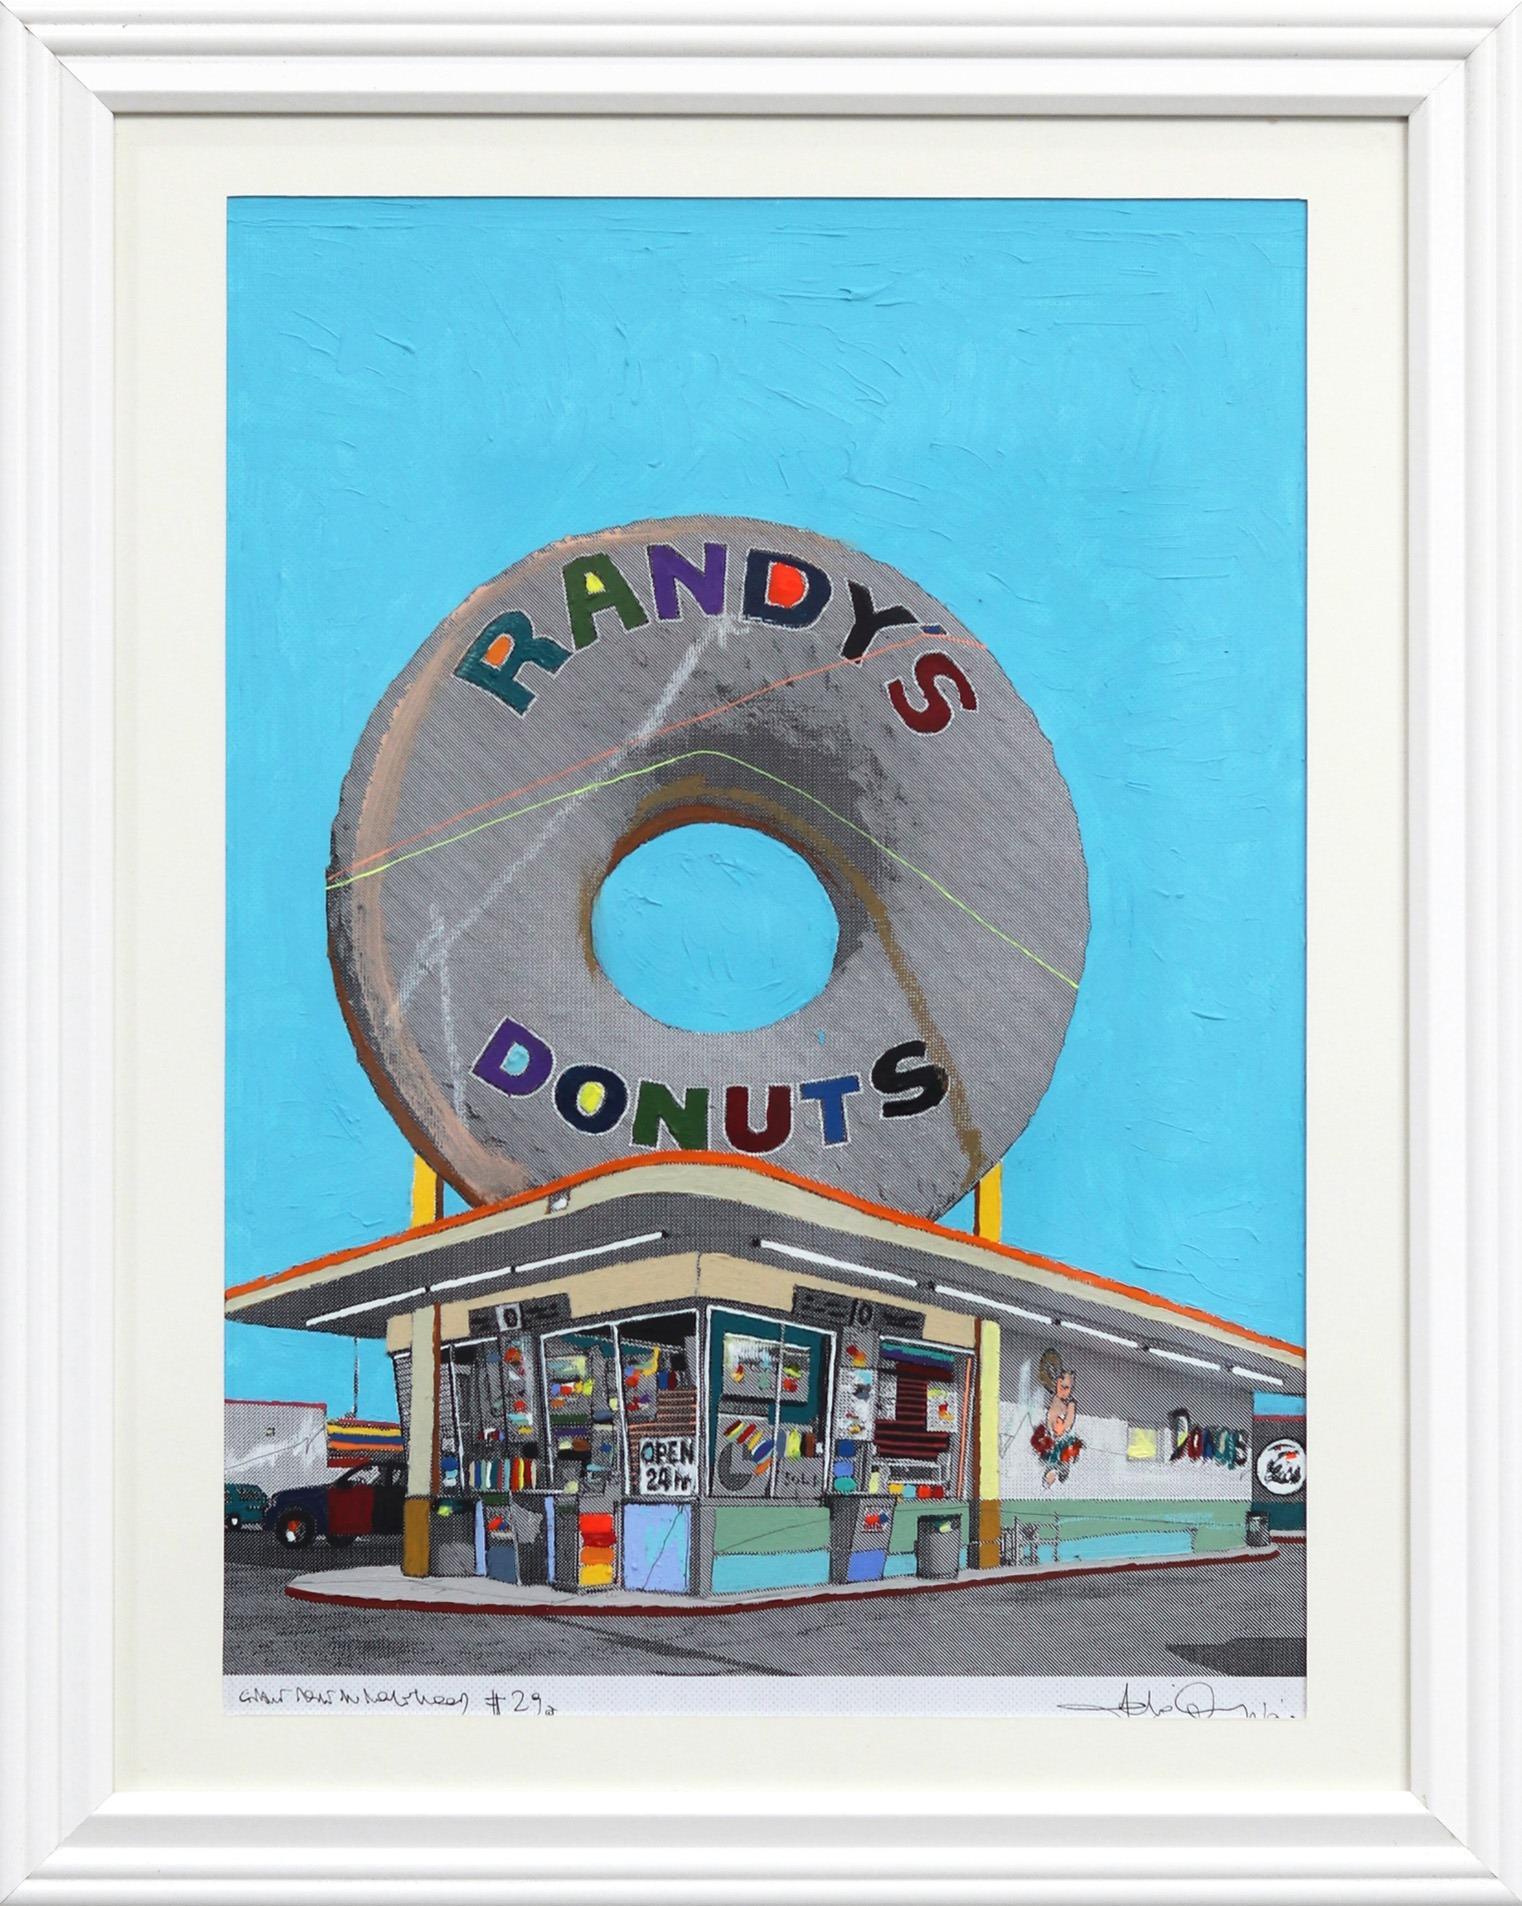 Giant Donut In Inglewood #29